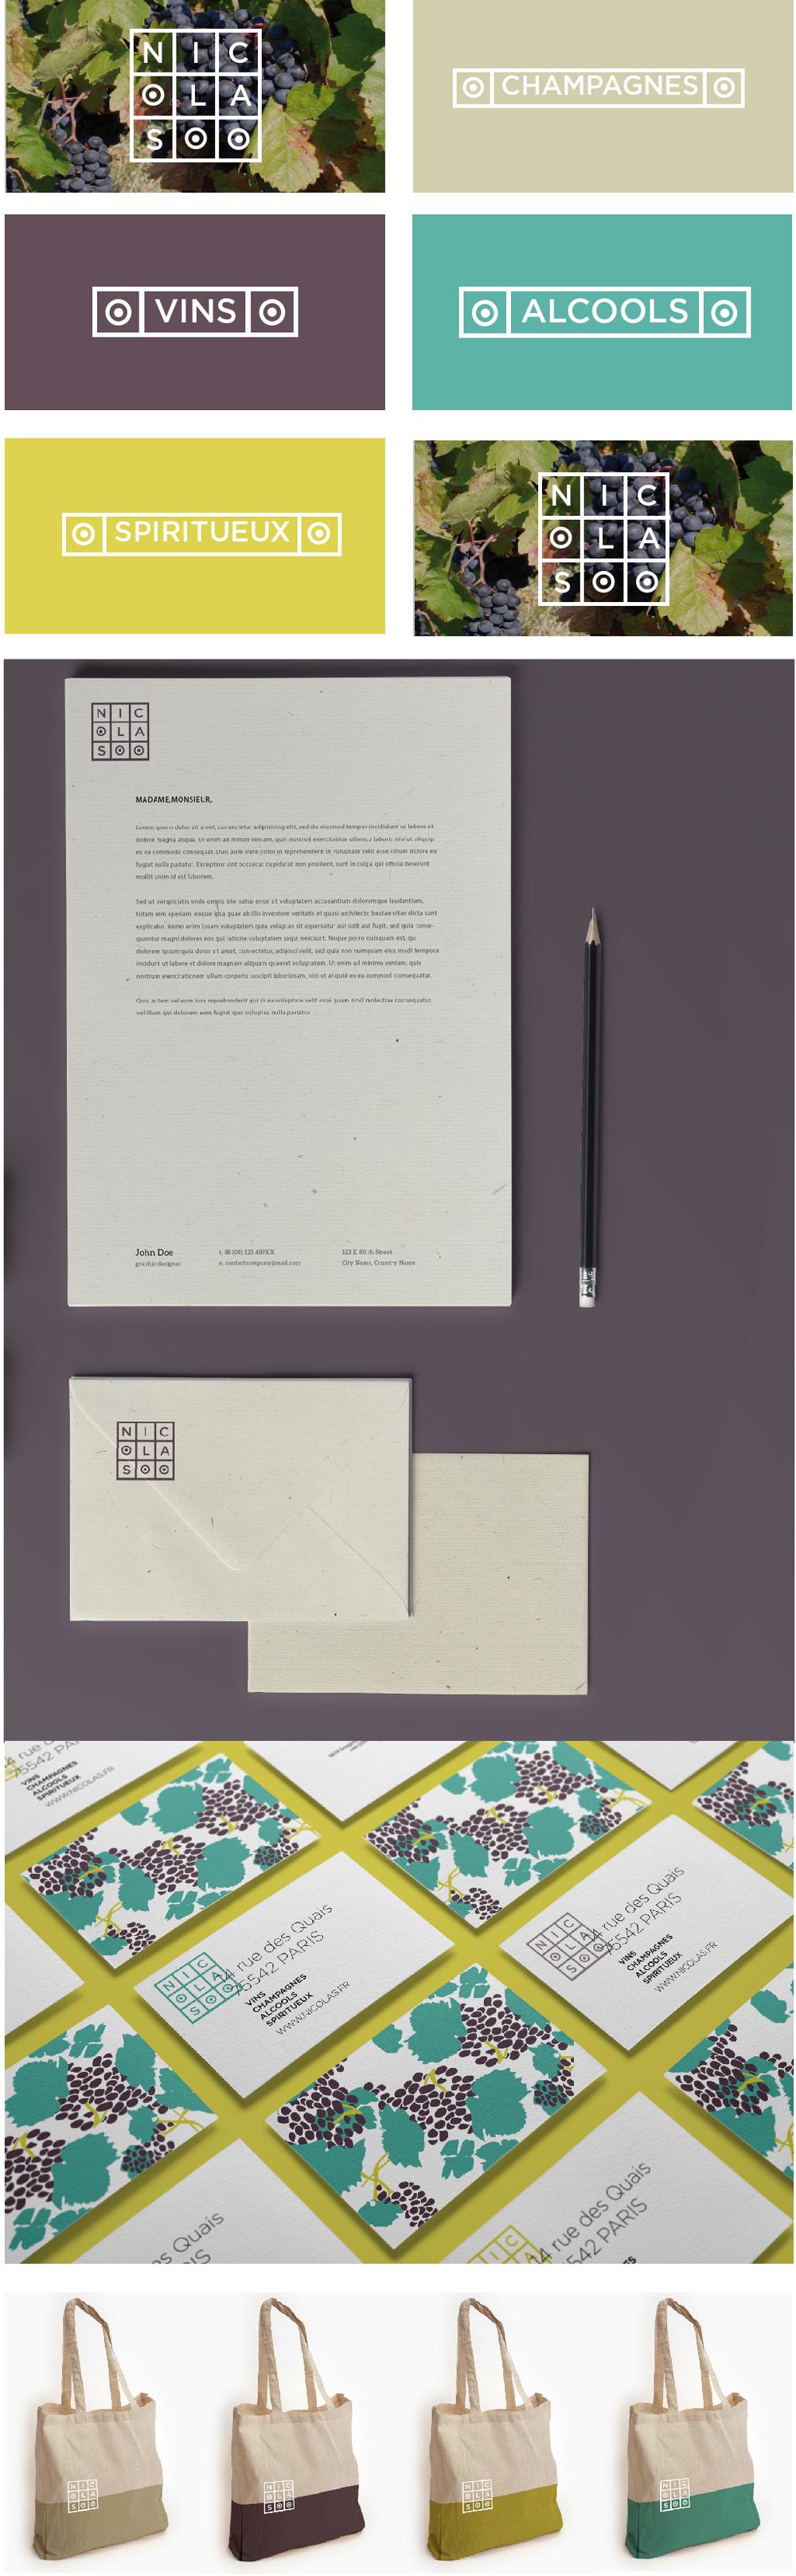 Création design papeterie et packaging